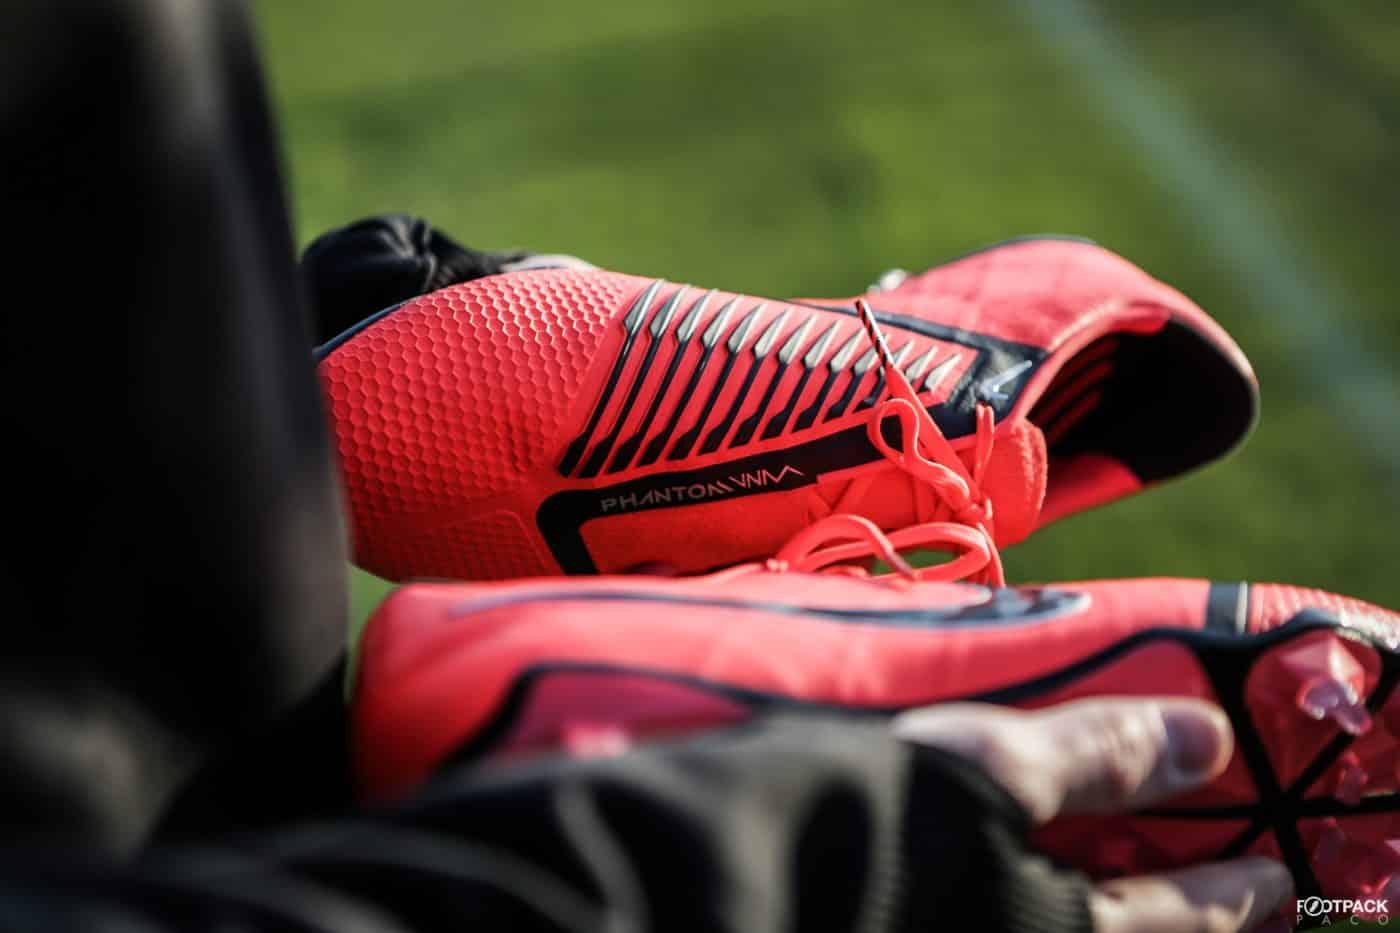 chaussures-nike-phantom-venom-footpack-2